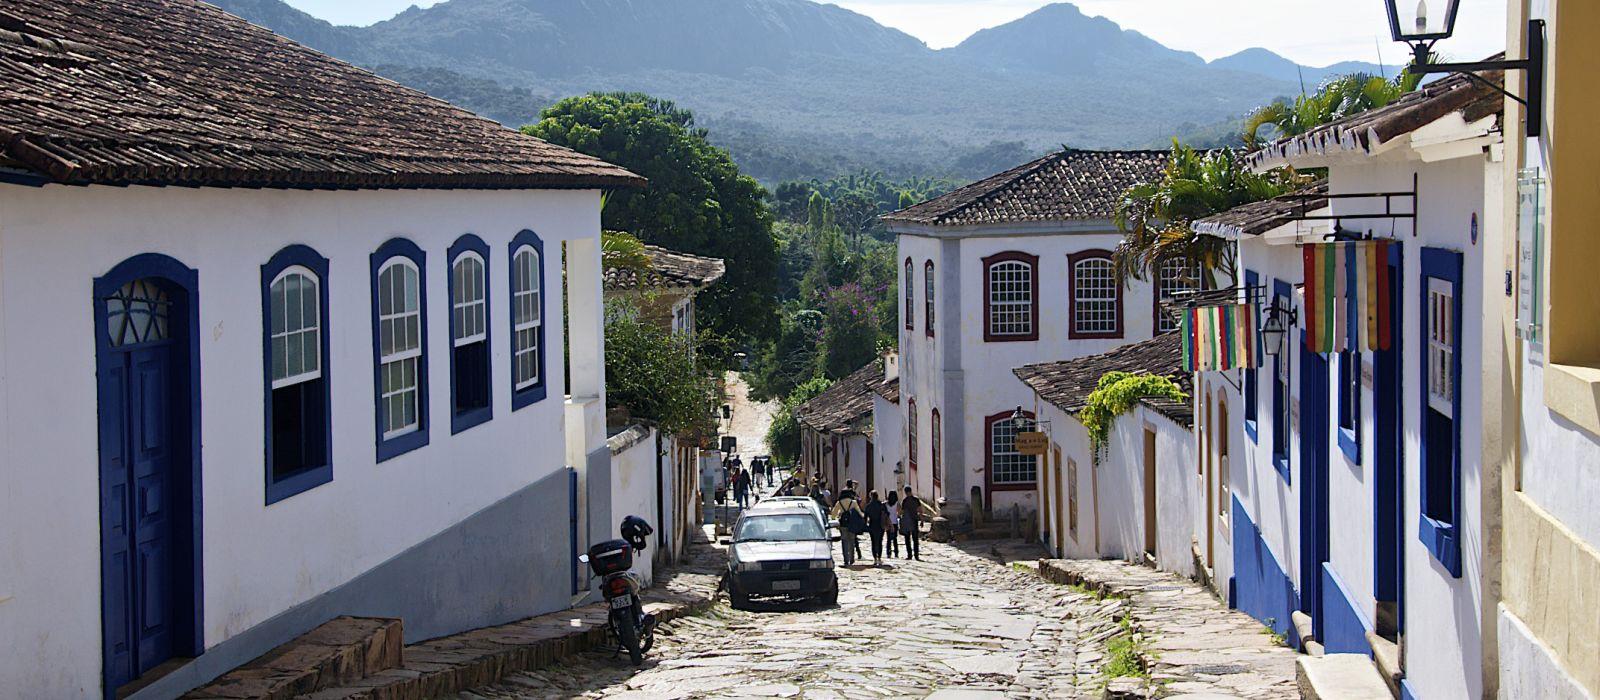 Reiseziel Tiradentes Brasilien